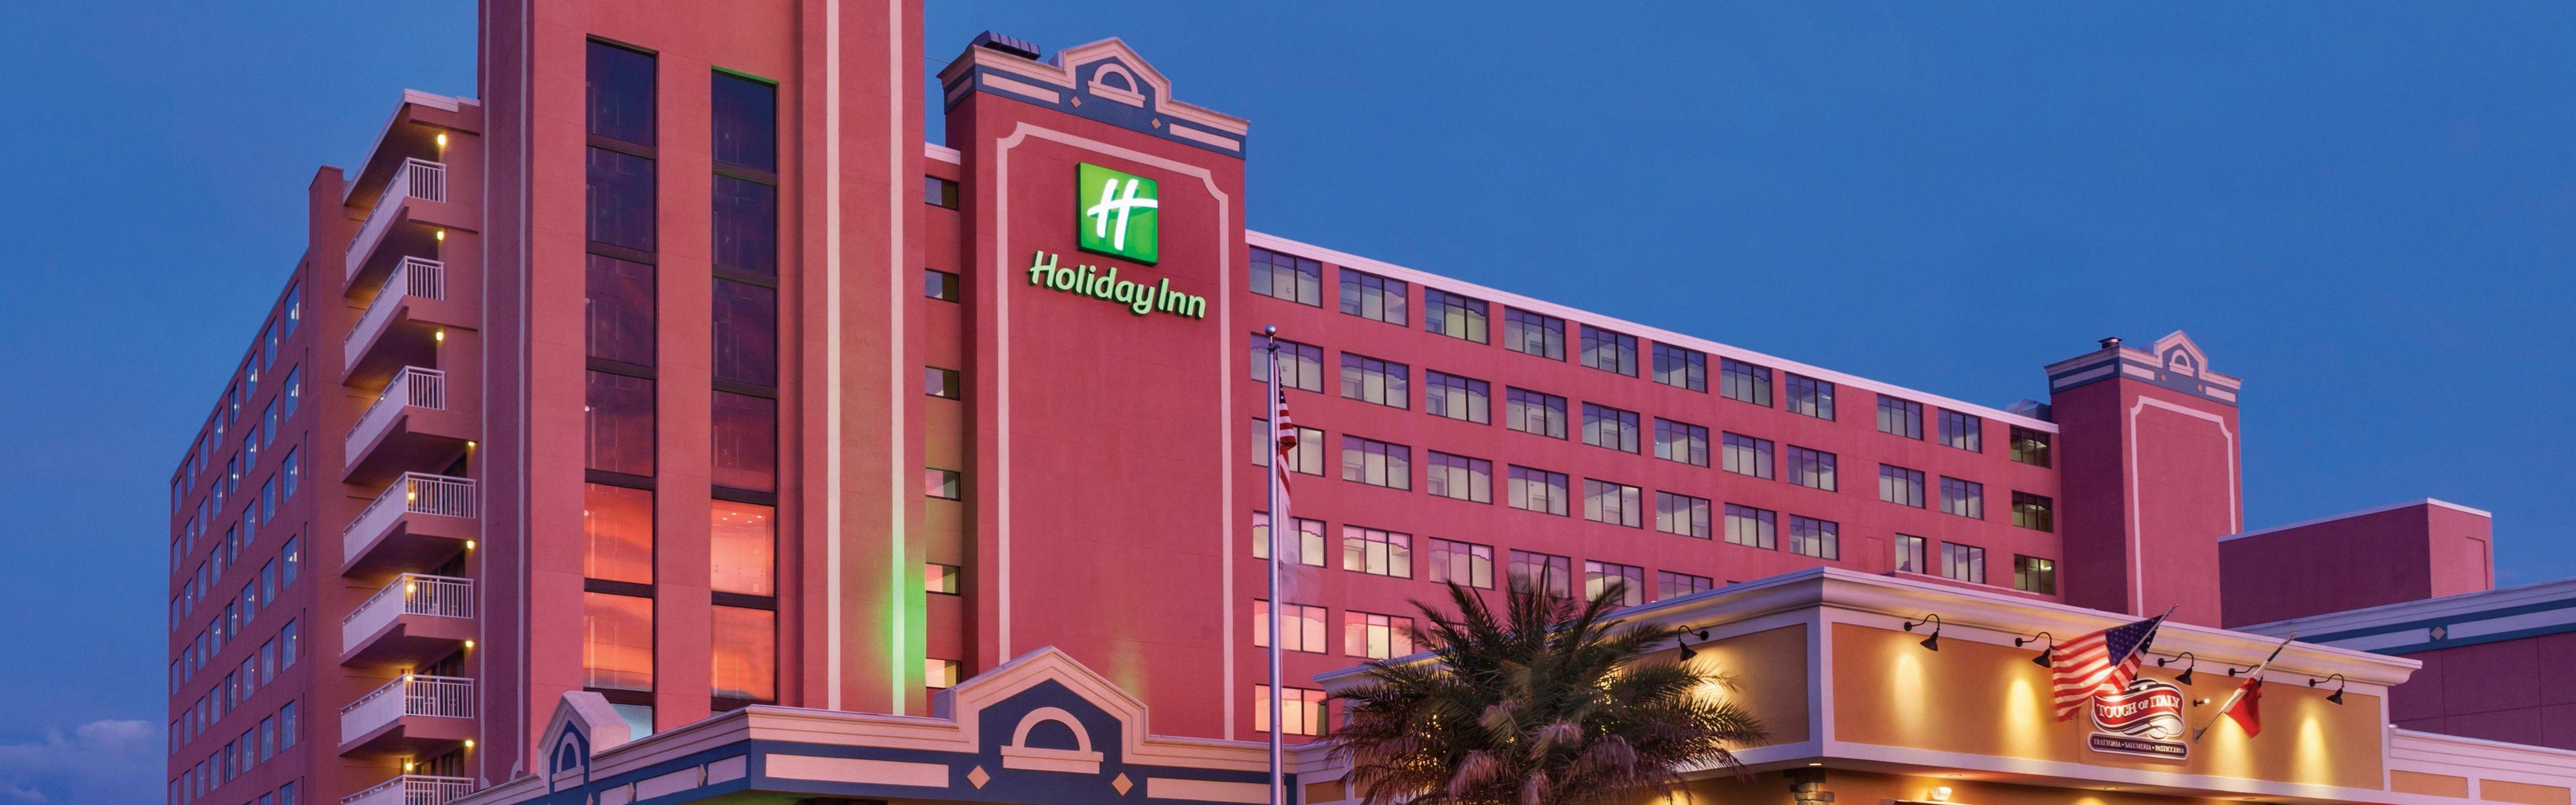 Marvelous Hotel Exterior ...